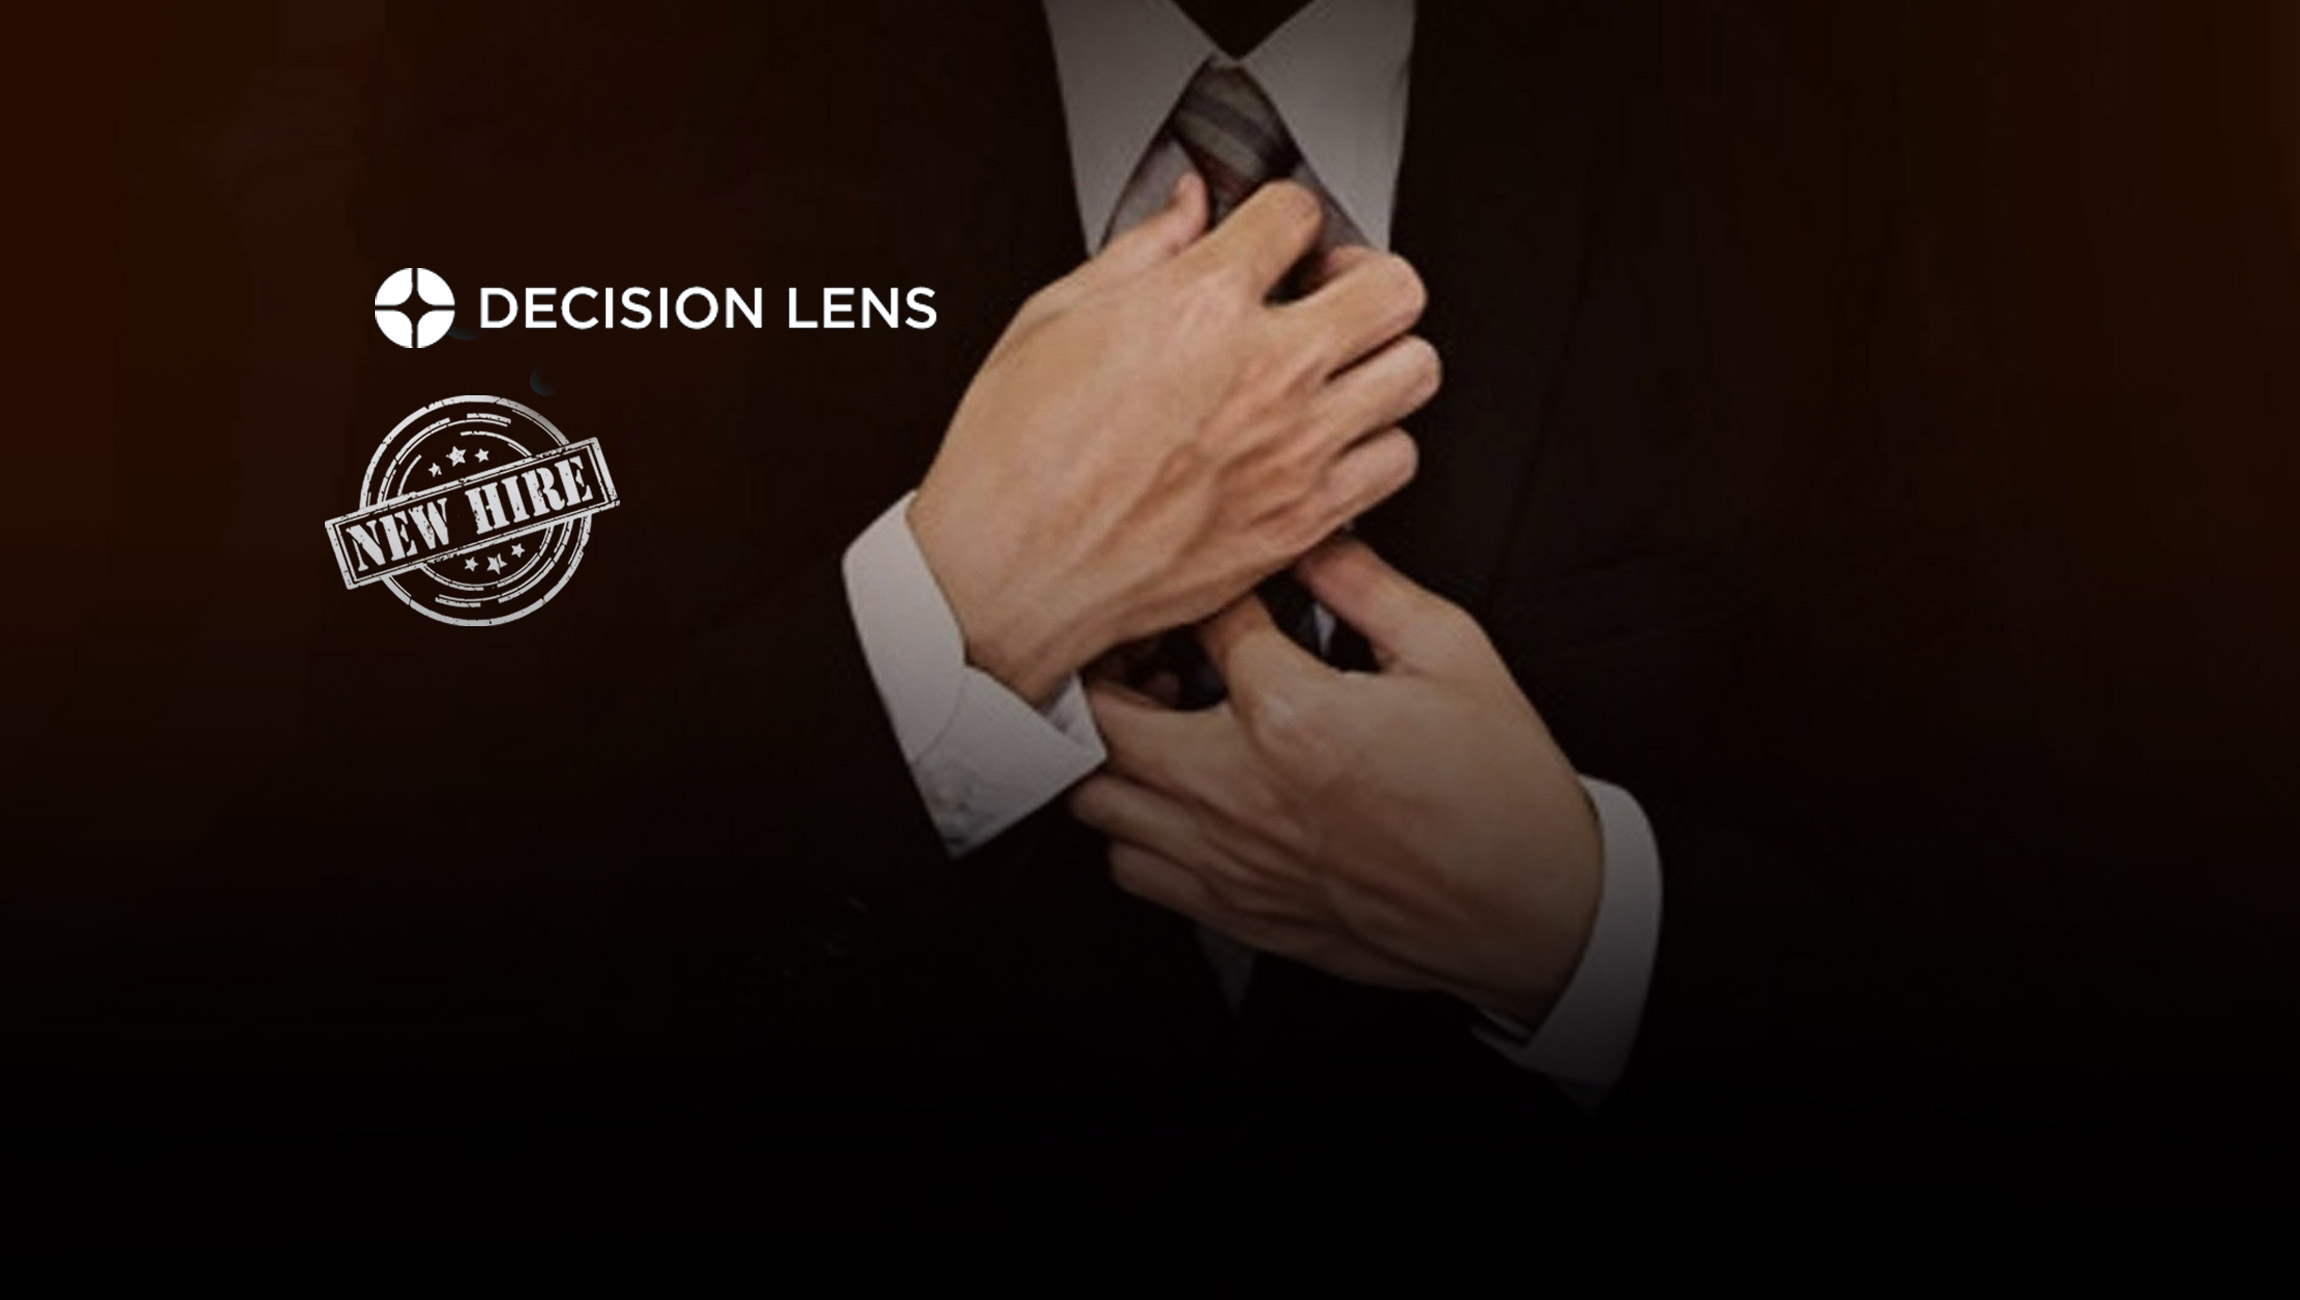 Decision Lens Expands Executive Team, Hires Josh Martin as Executive Vice President, Marketing